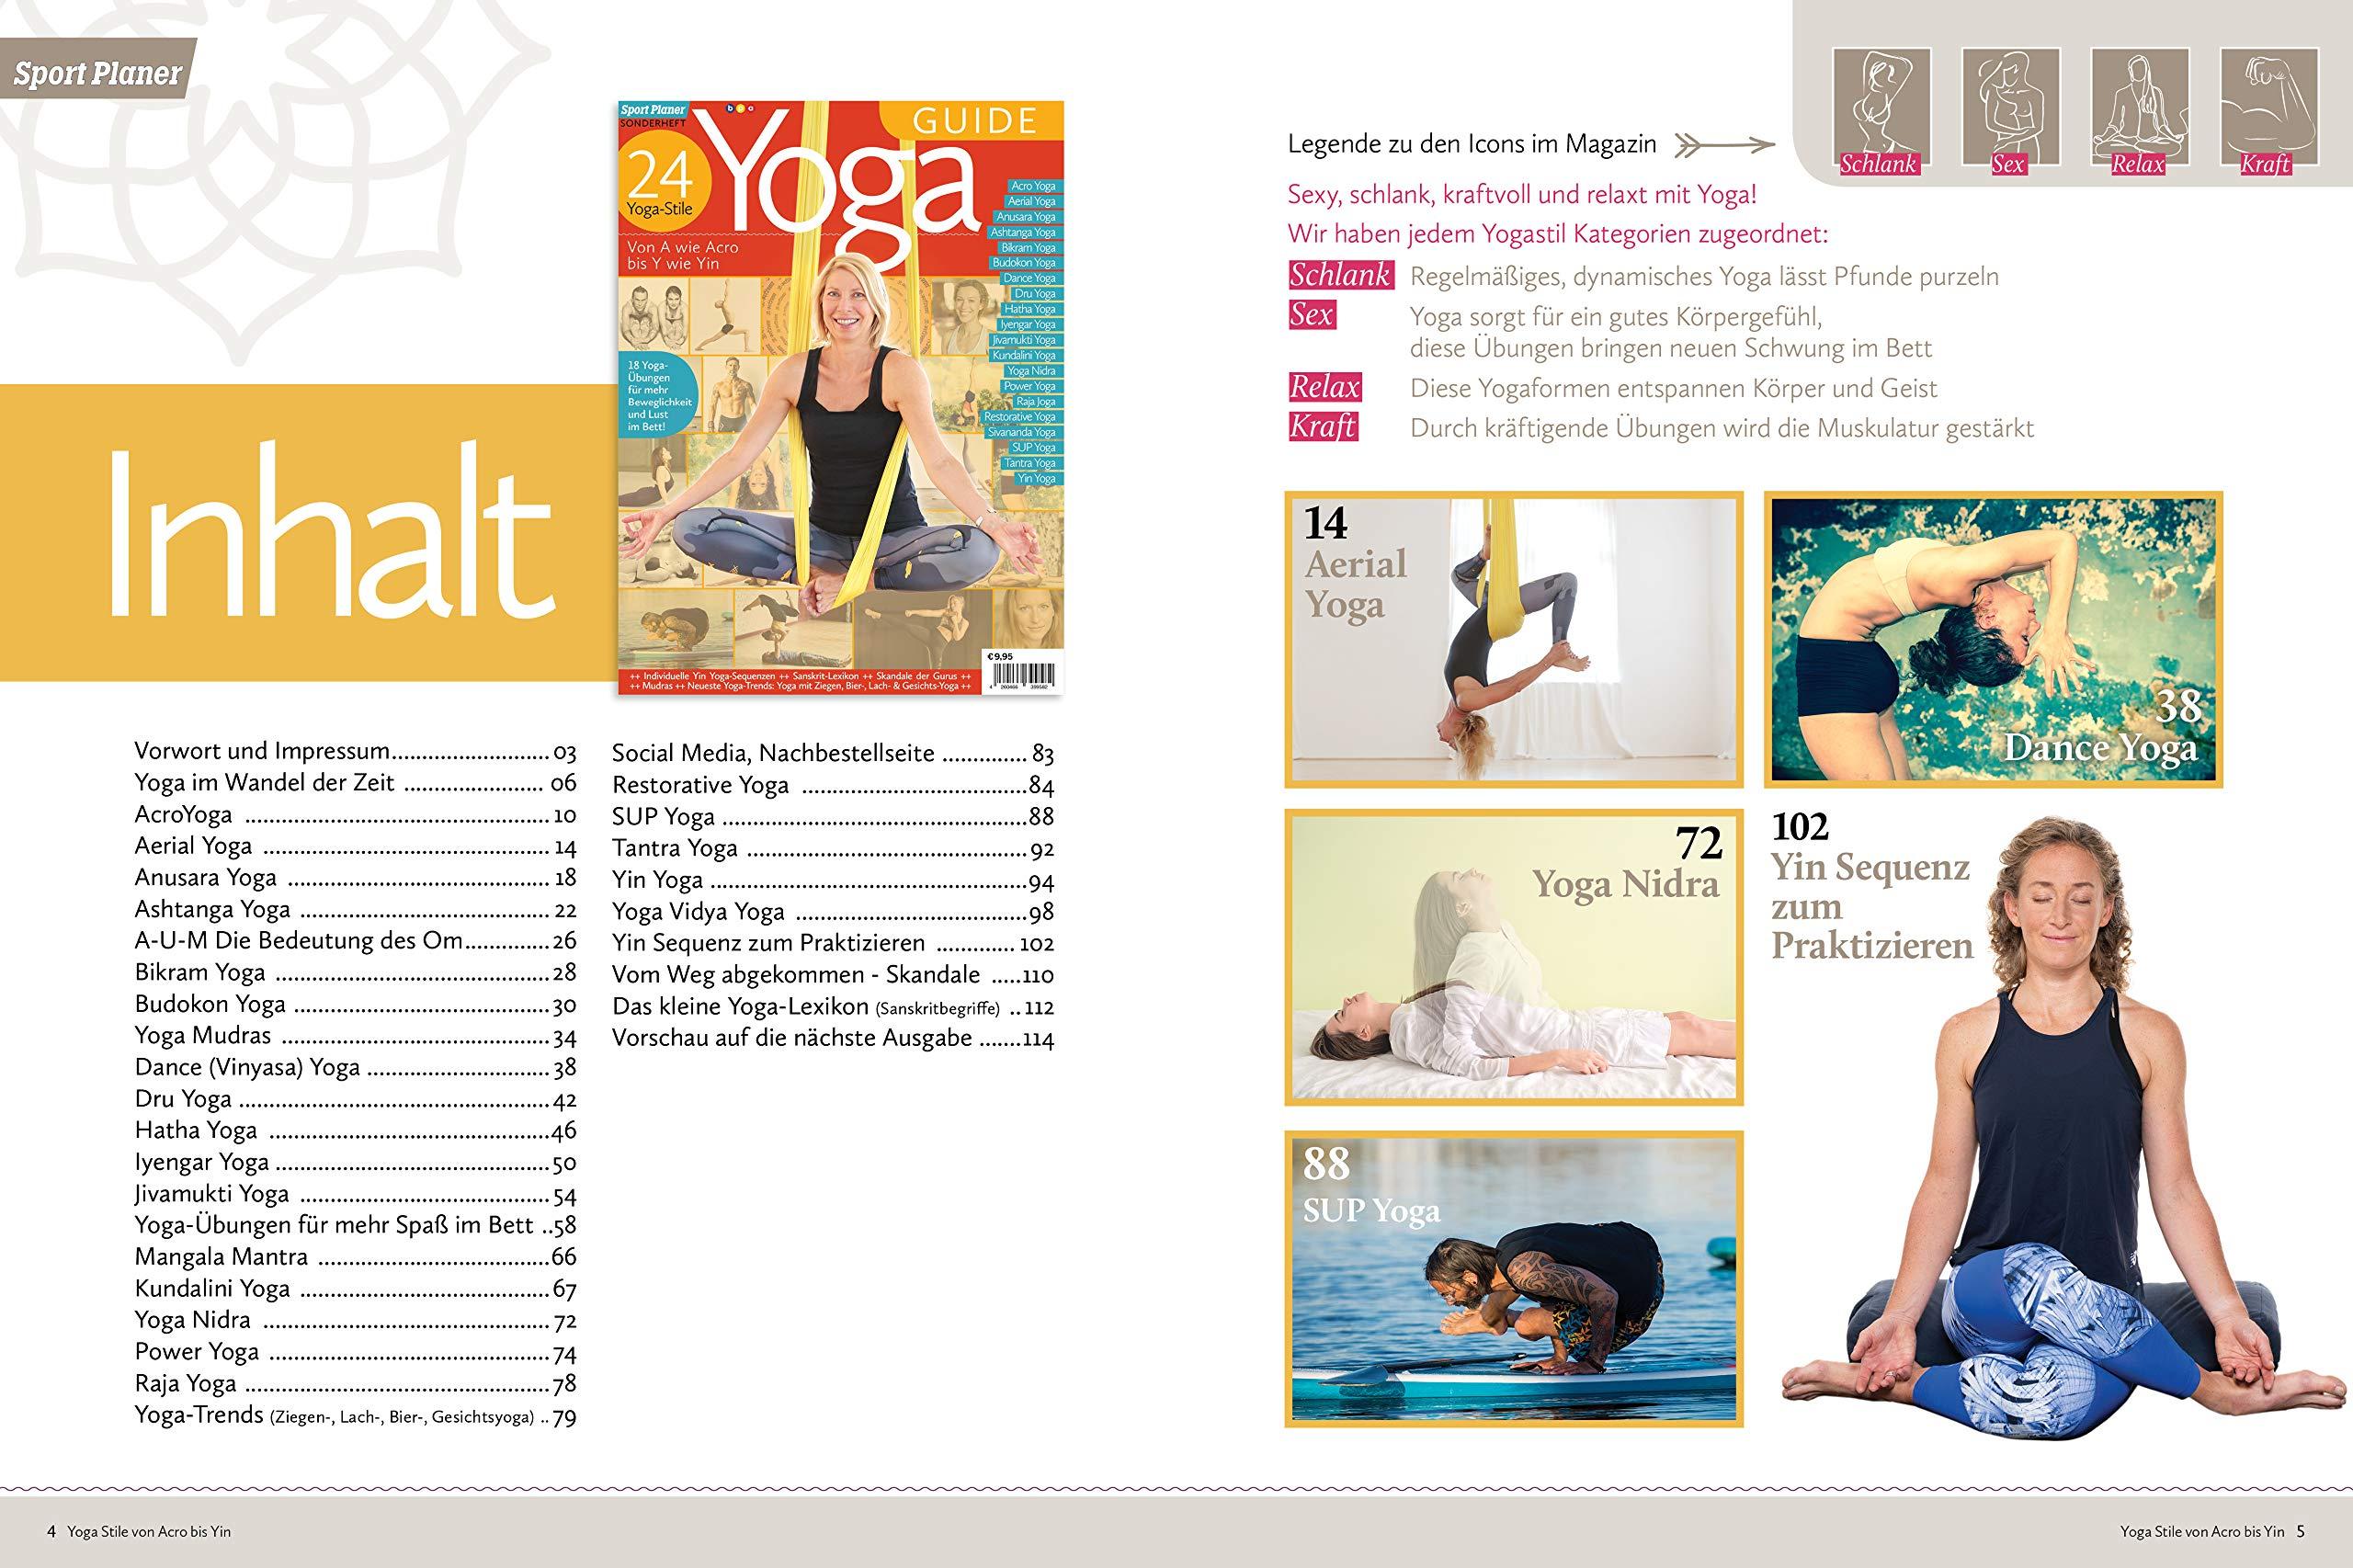 Yoga GUIDE - 24 Yoga-Stile: Von A wie Acro bis Y wie Yin ...